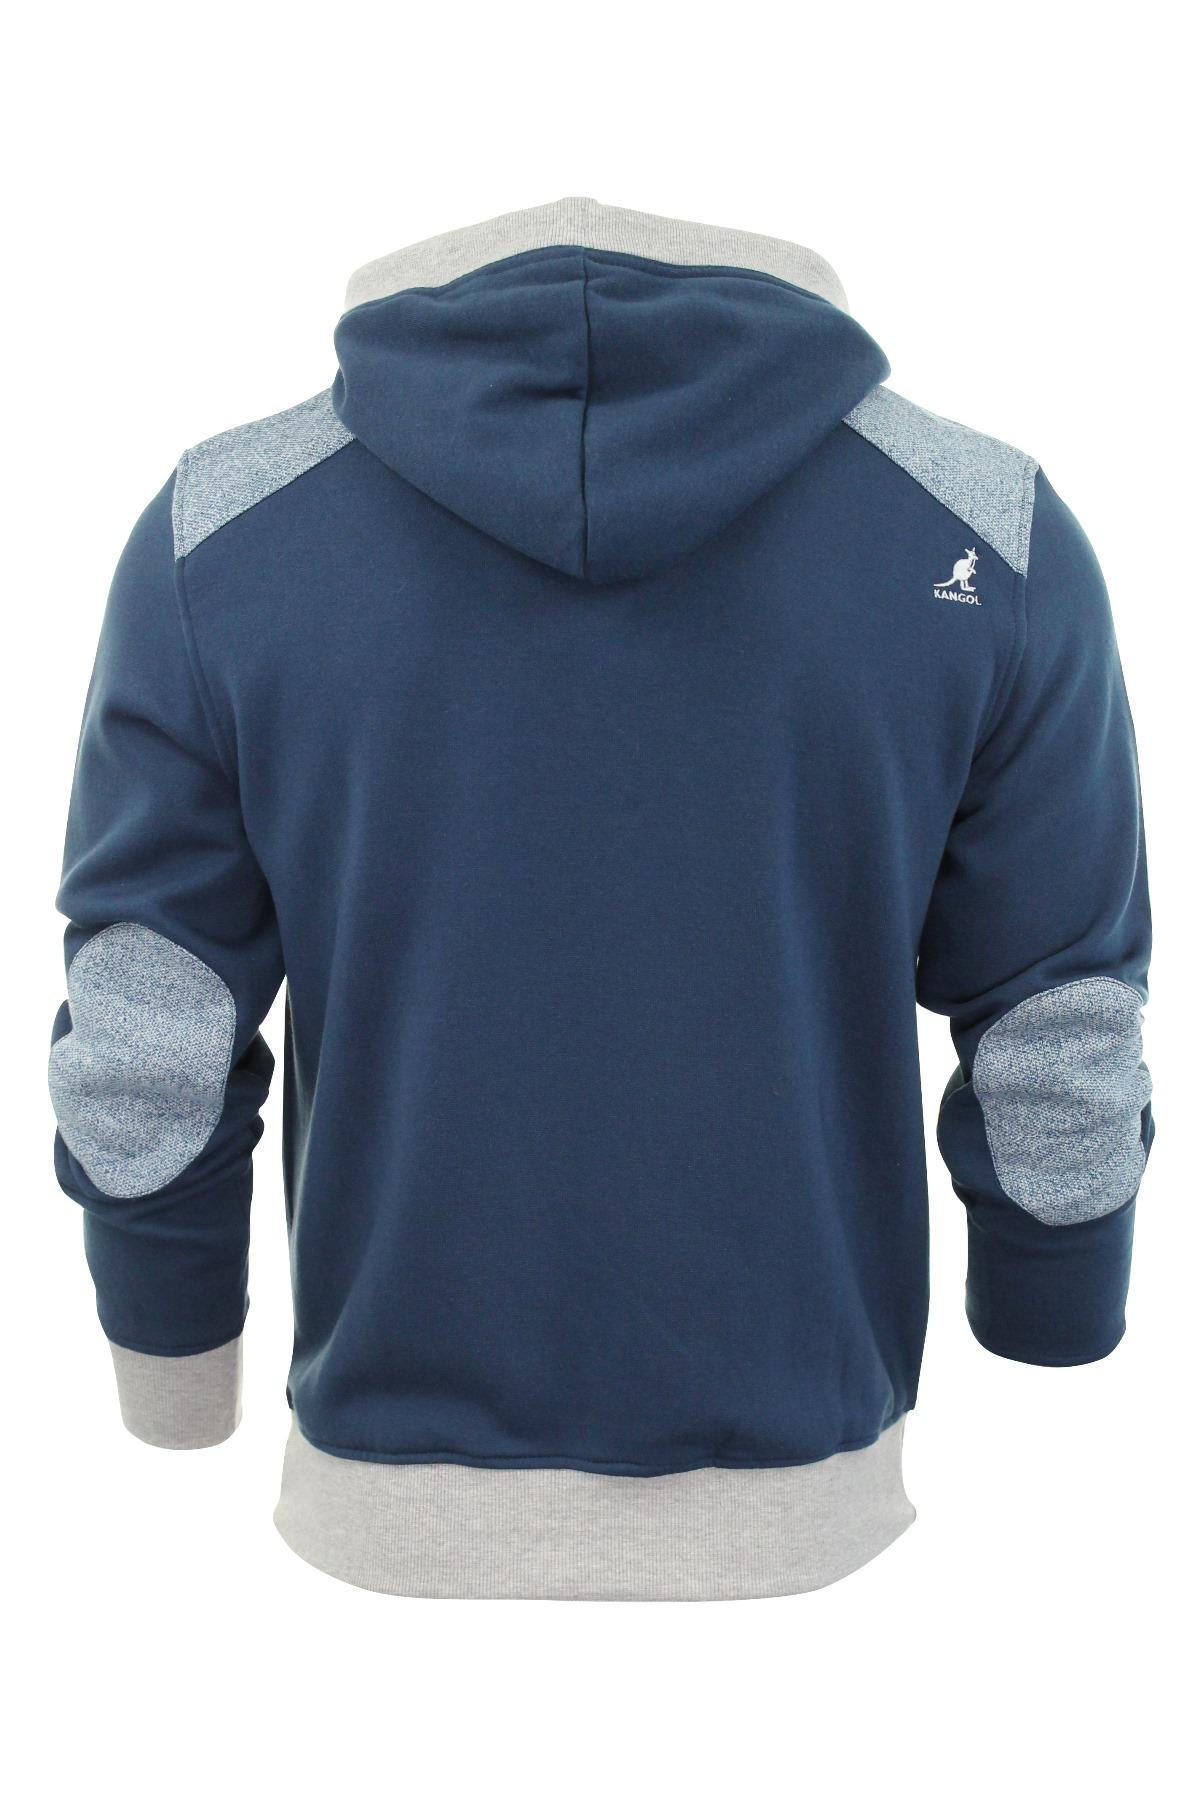 Kangol Mens Jumper Hoodie Sweater Top 'Mortar'